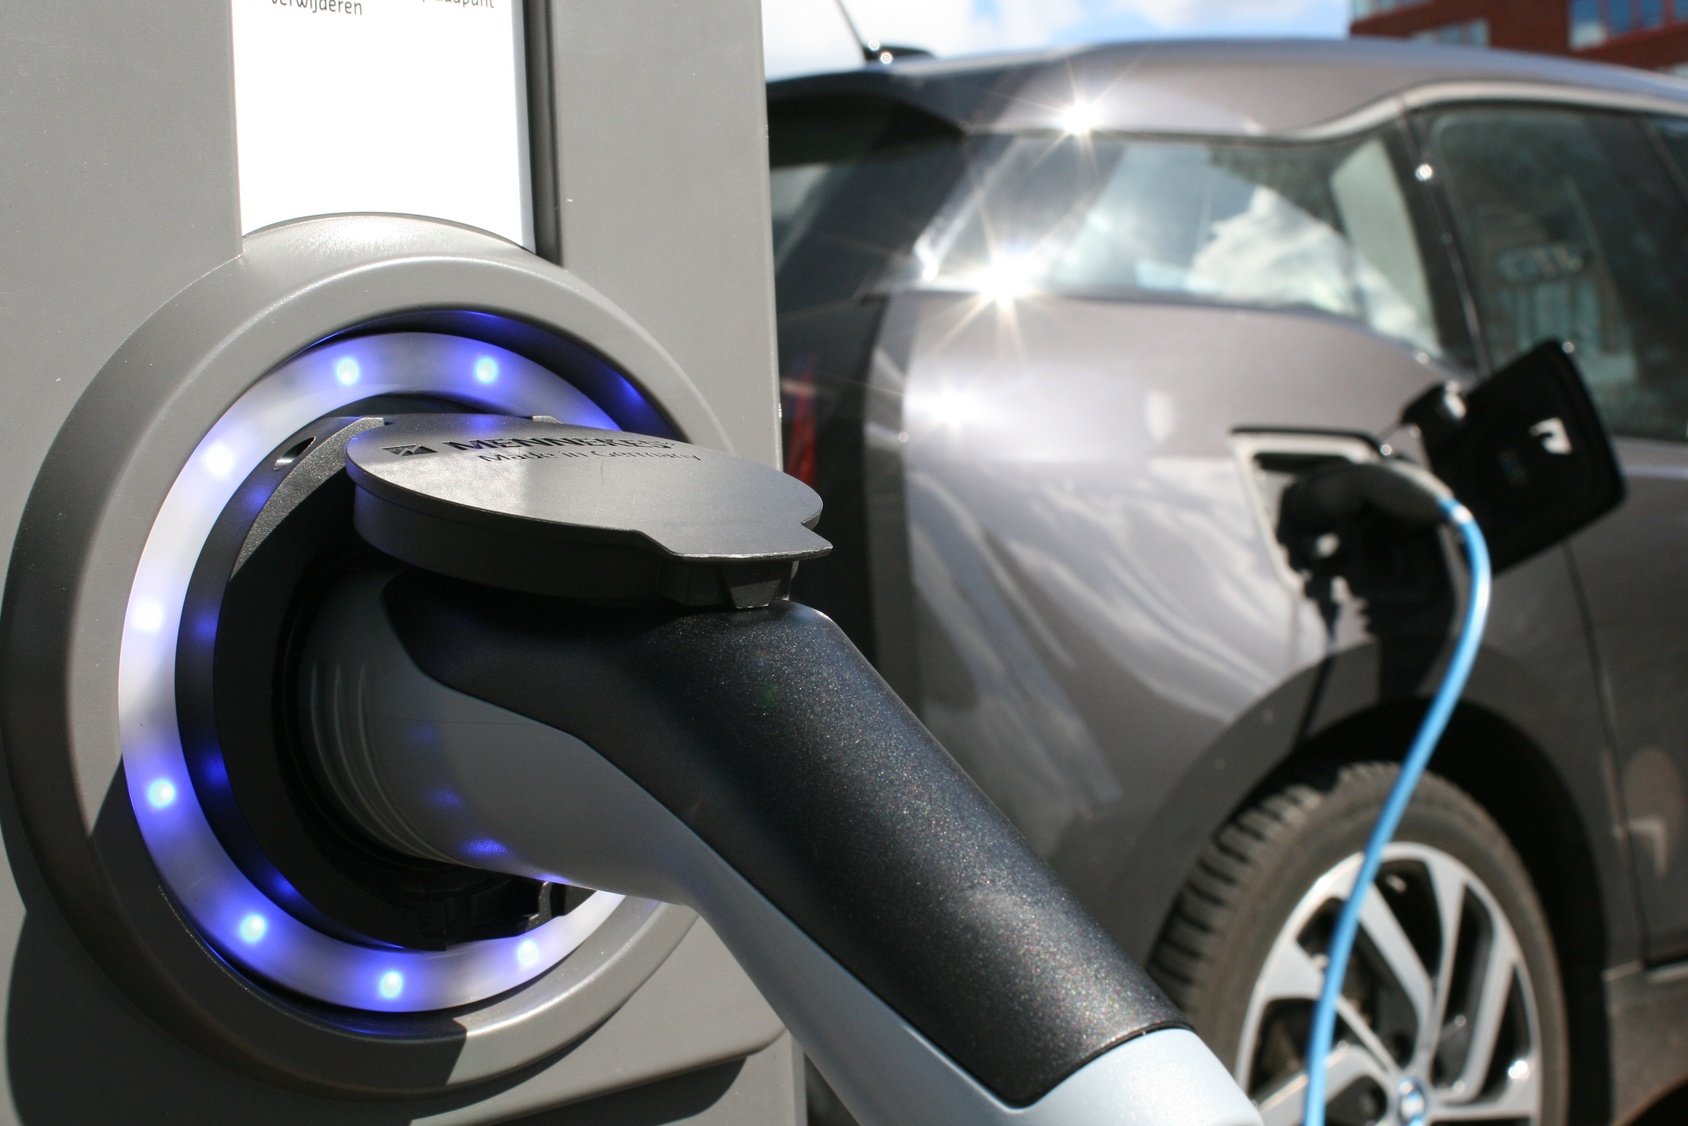 Elektrofahrzeuge intelligent einsetzen - Berater für Elektromobilität- eta Energieberatung